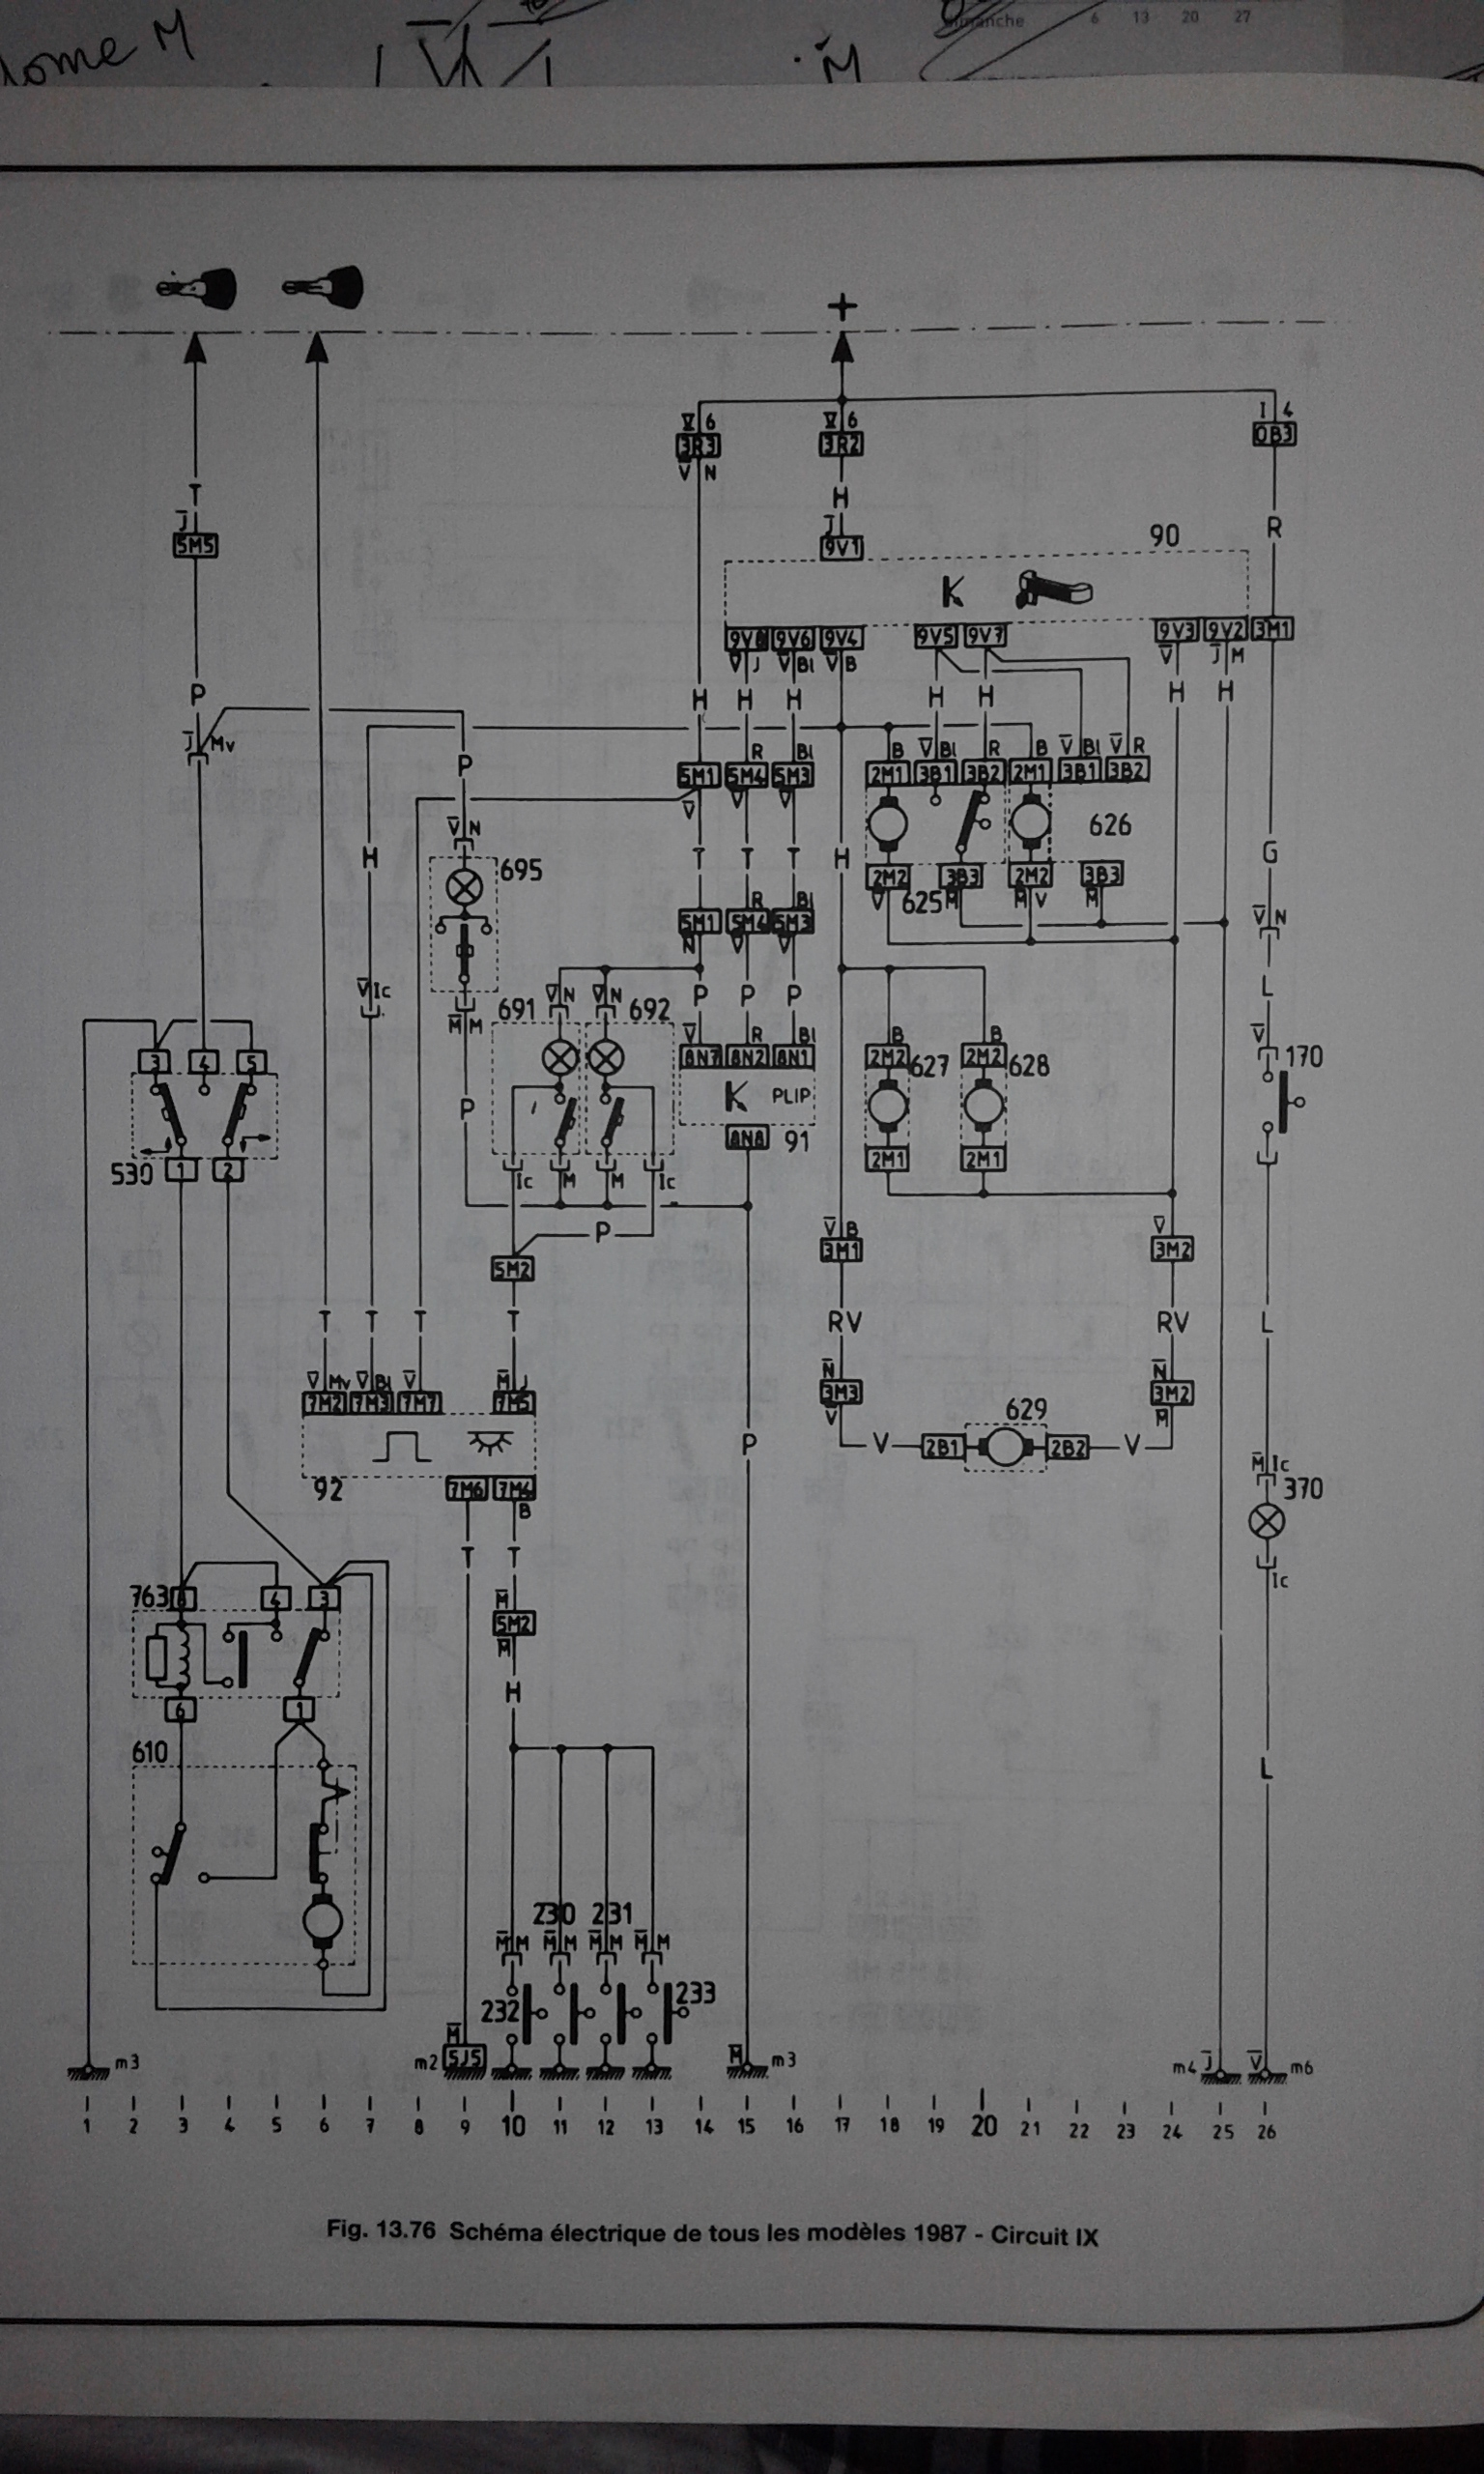 kit de centralisation - Page 1 - yAronet